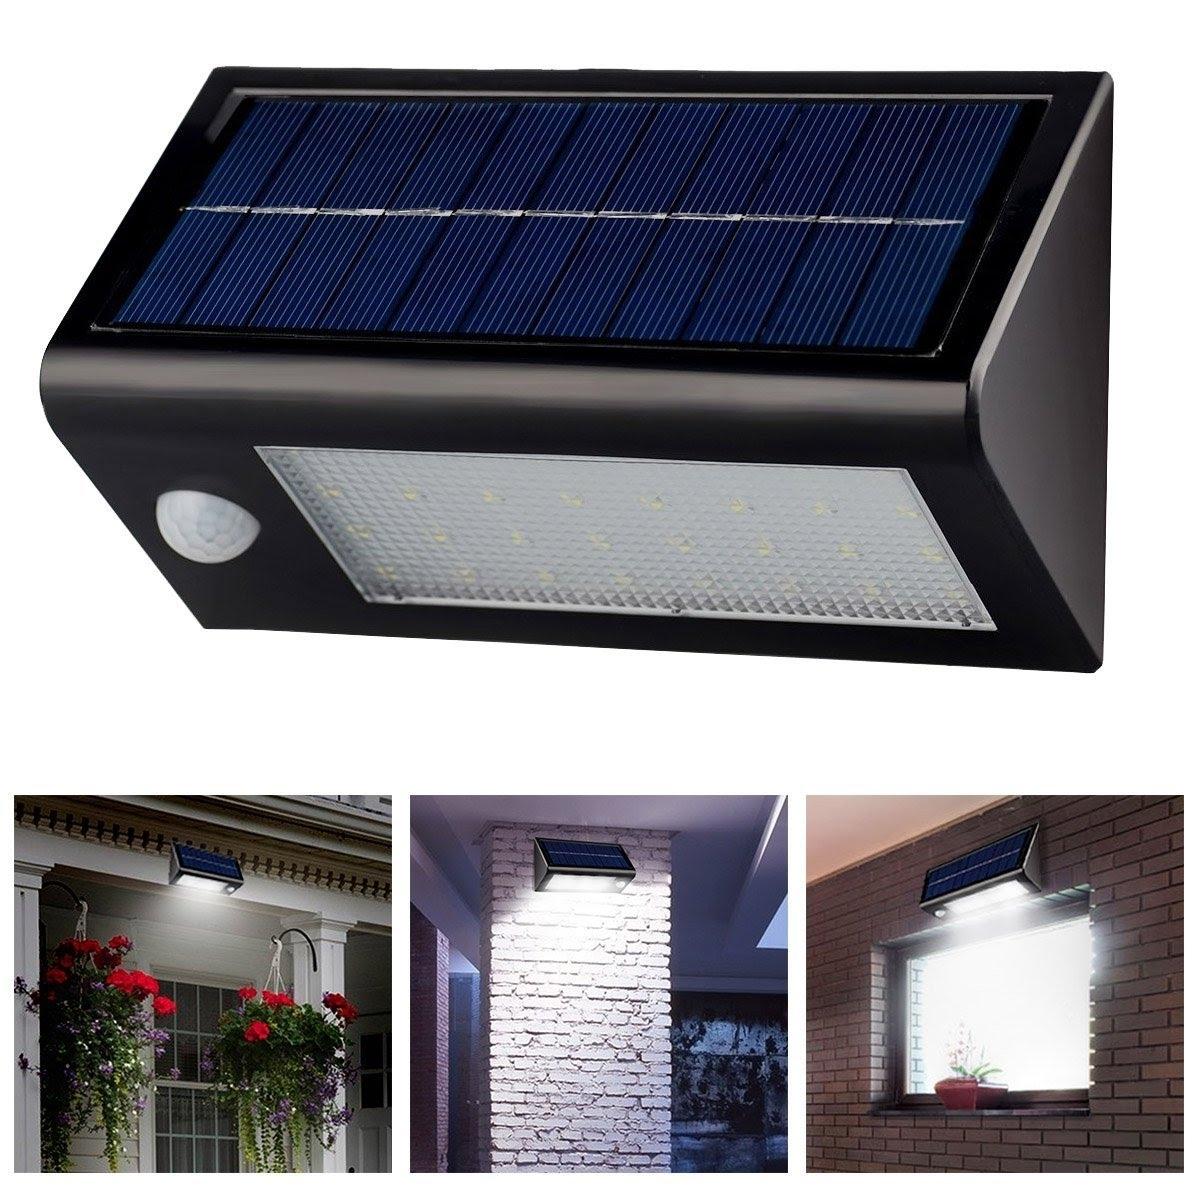 Outdoor Wall Solar Lighting For 2019 Innogear® Solar Powered Outdoor Motion Sensor Light – Youtube (View 7 of 20)